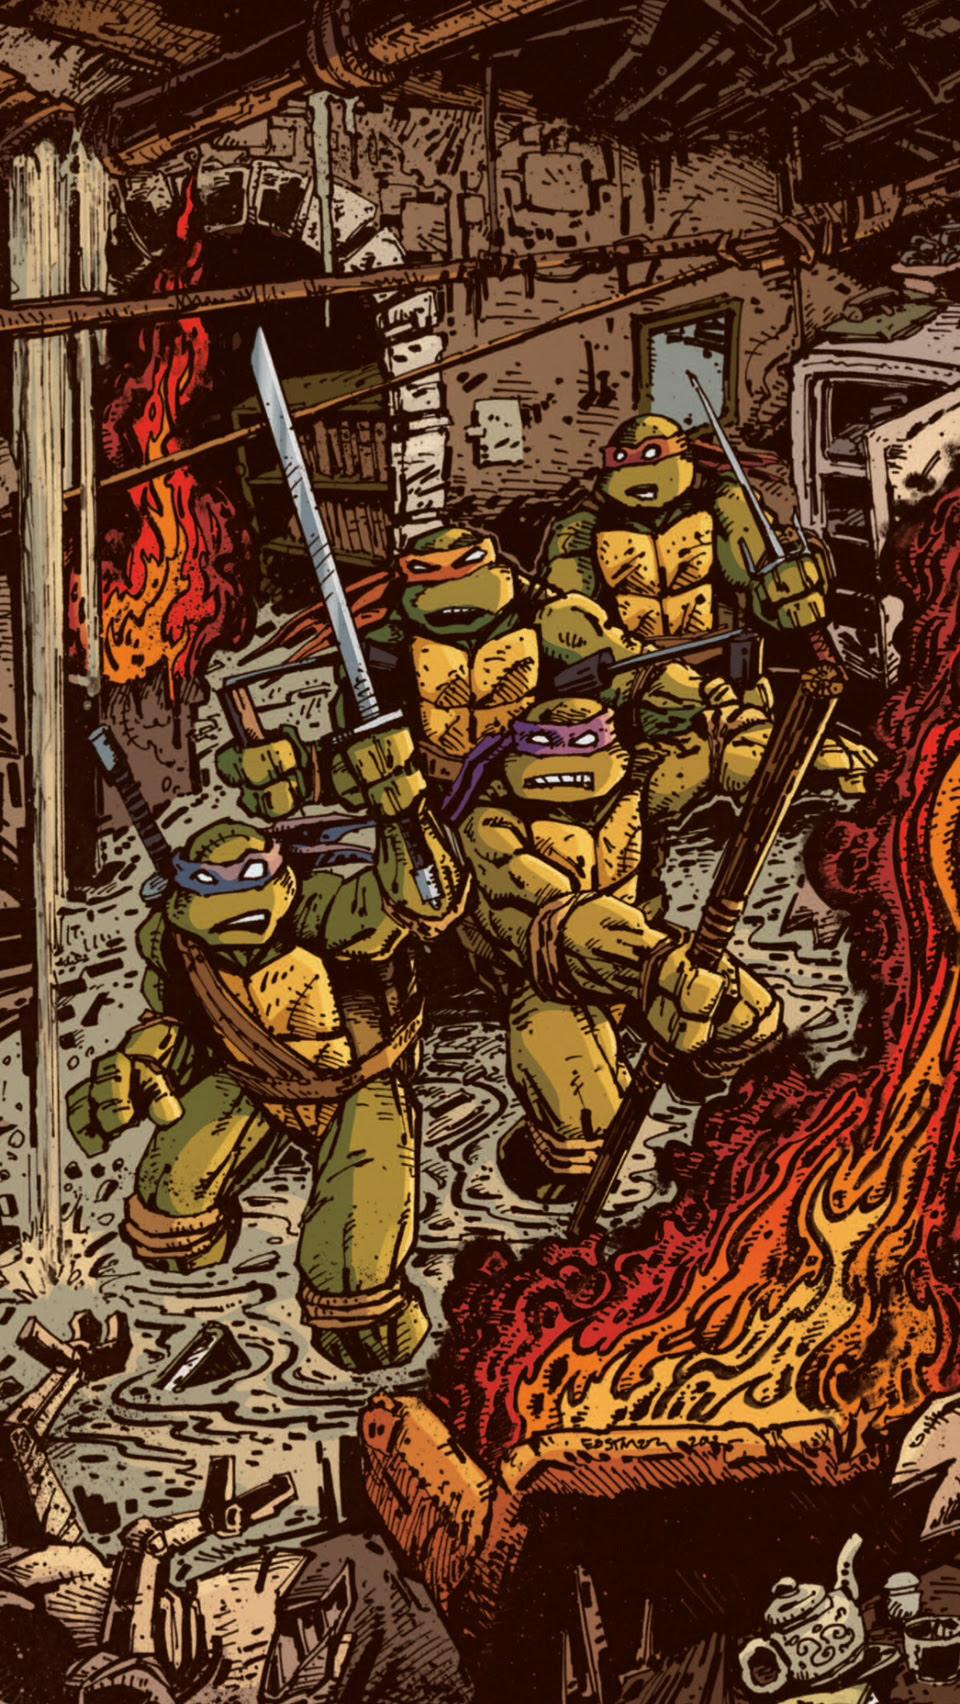 teenage-mutant-ninja-turtles-idw-comic-iphone-wallpaper ...